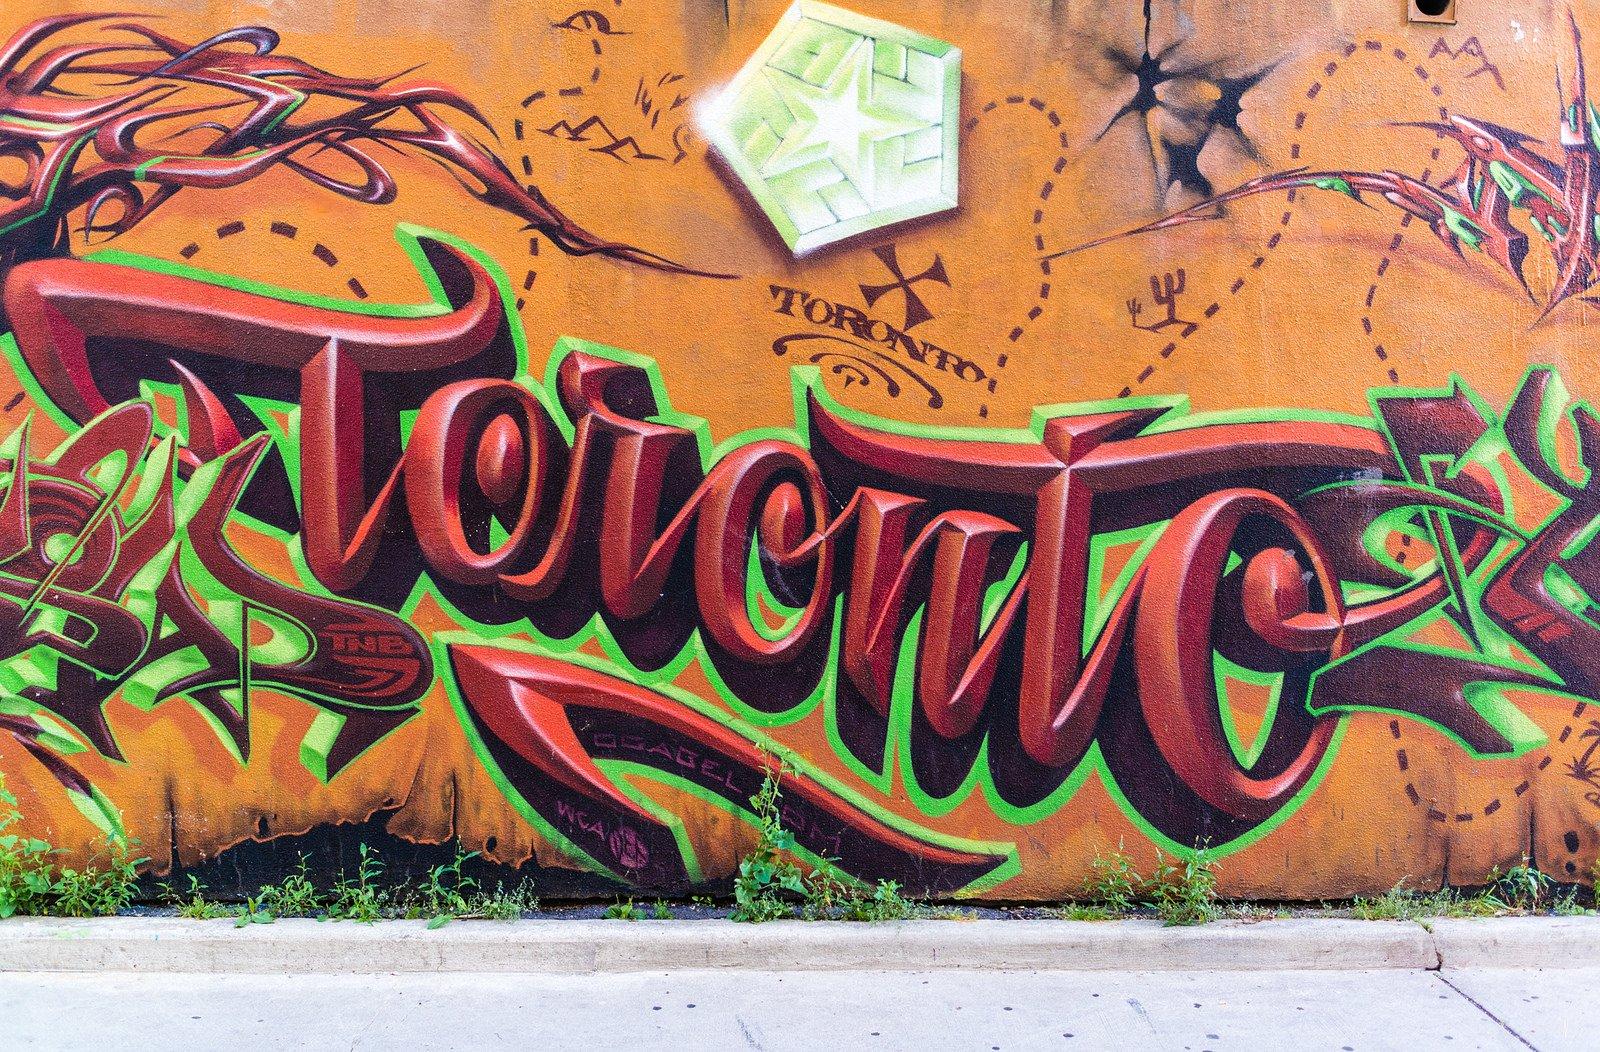 Graffiti wall toronto downtown - Art Buildings Cities City Colors Graff Graffiti Illegal Toronto Canada Street Wall Wallpaper 1600x1052 450627 Wallpaperup